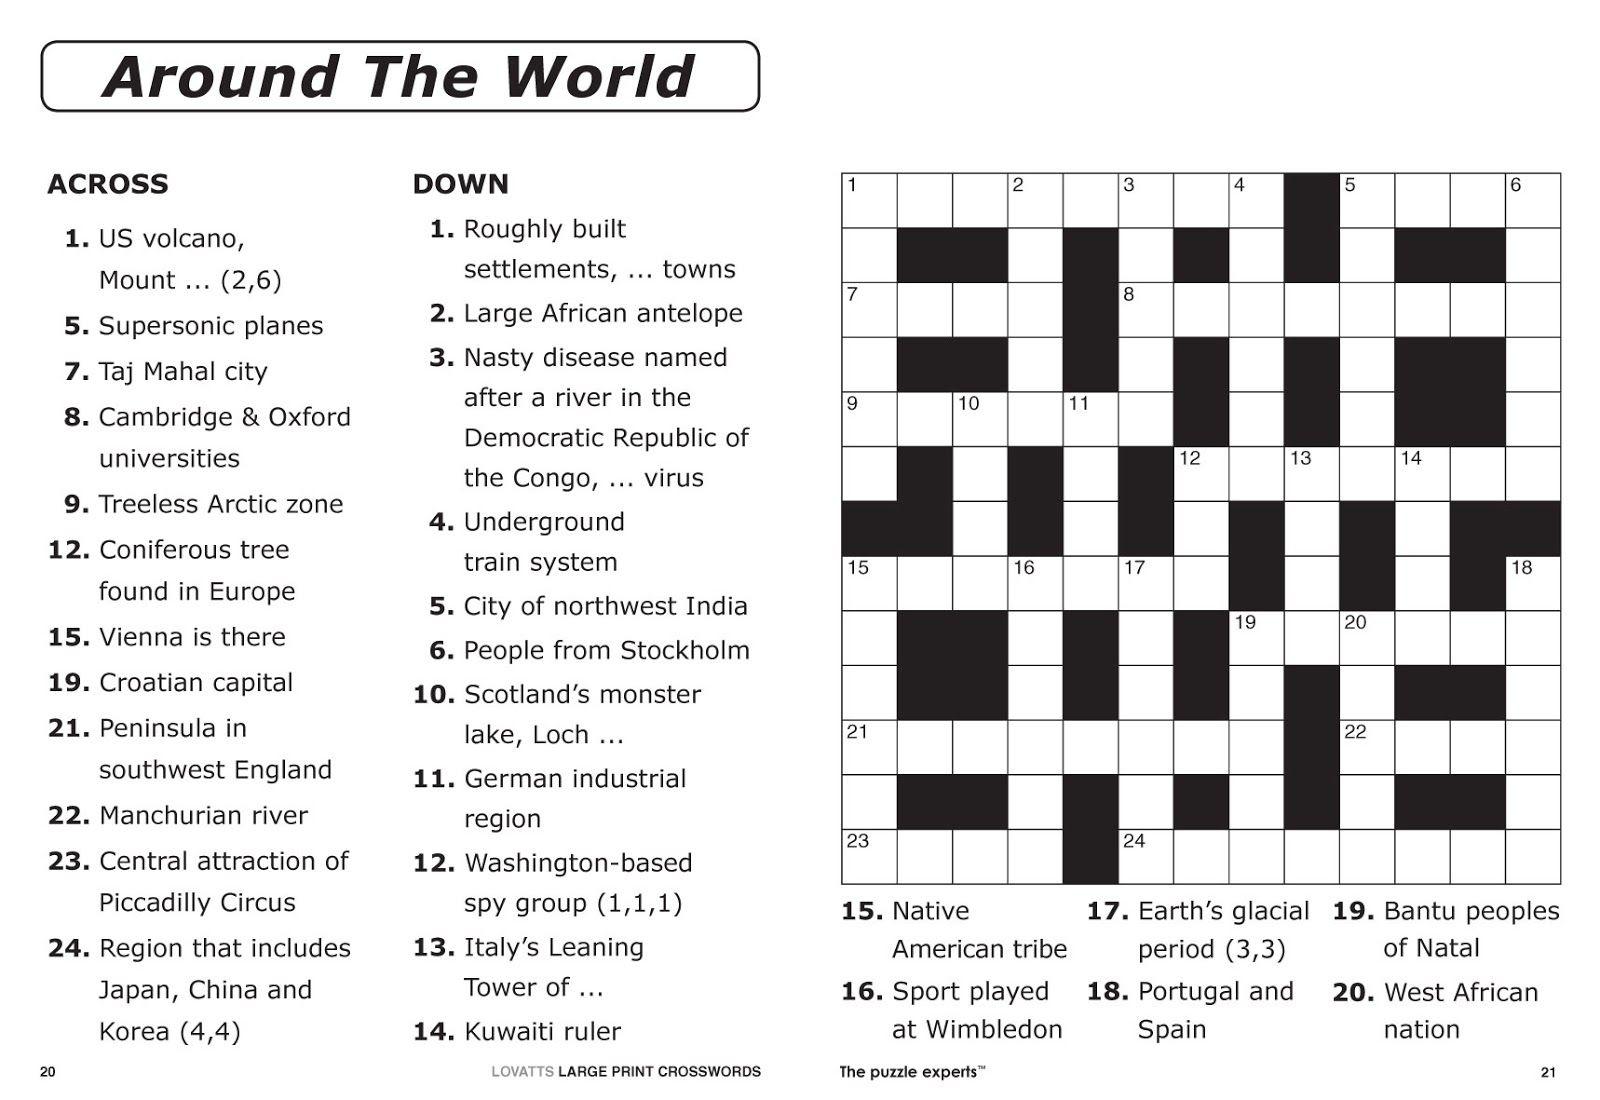 Easy Printable Crossword Puzzles | Elder Care & Dementia Care - Large Print Crossword Puzzle Books For Seniors